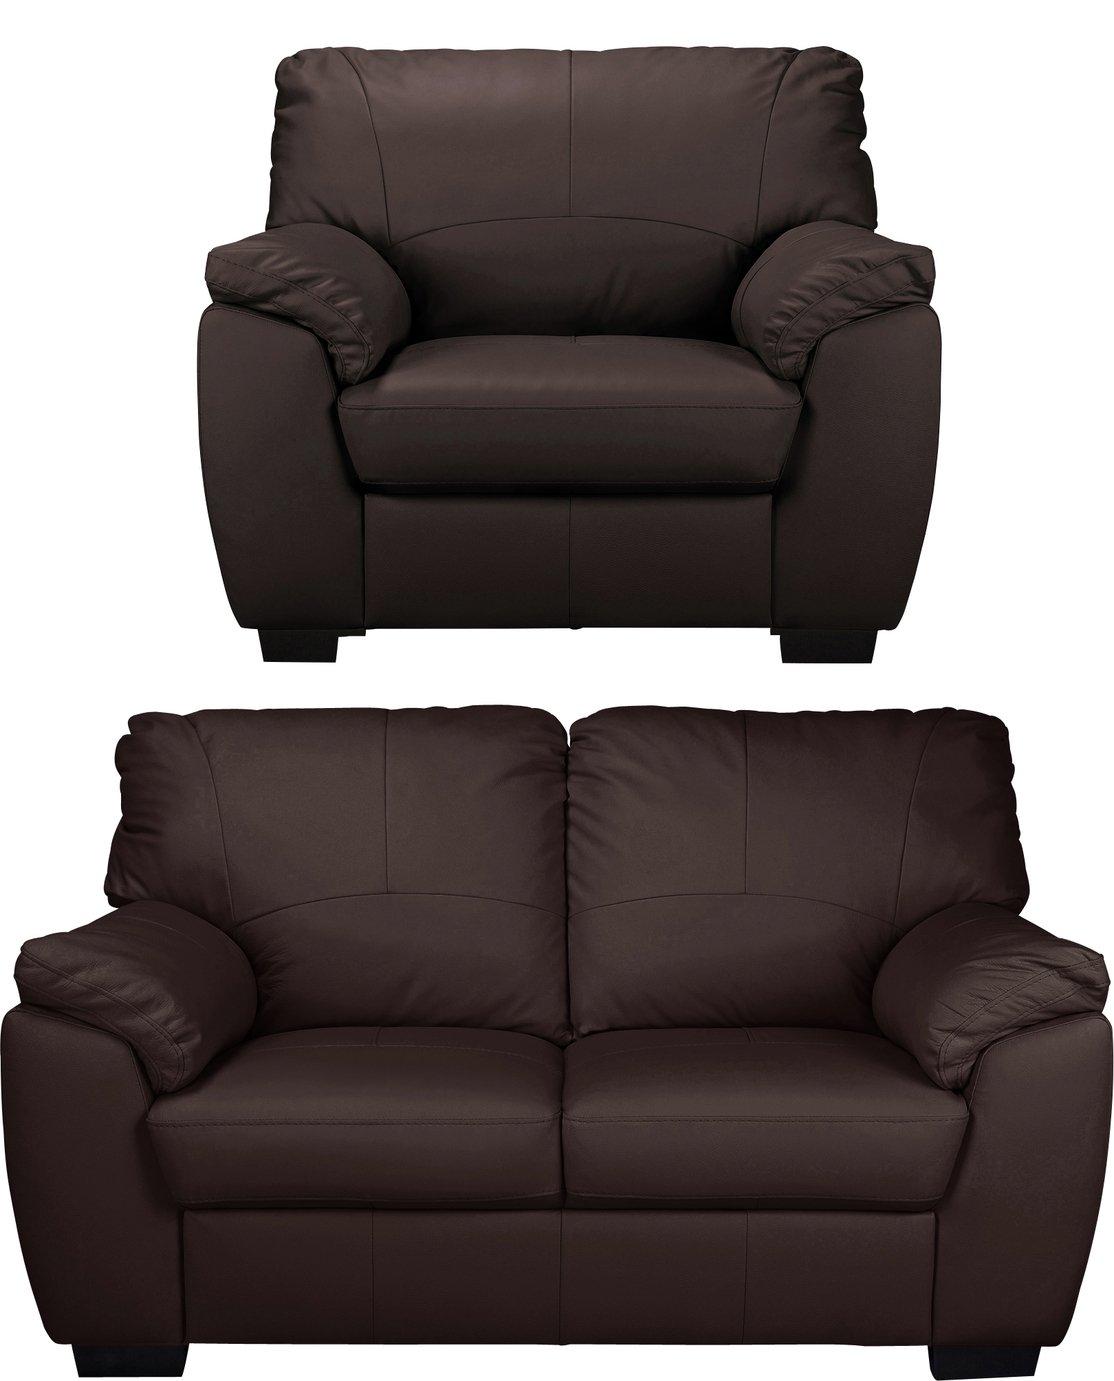 Argos Home Milano Leather Chair & 2 Seater Sofa - Chocolate